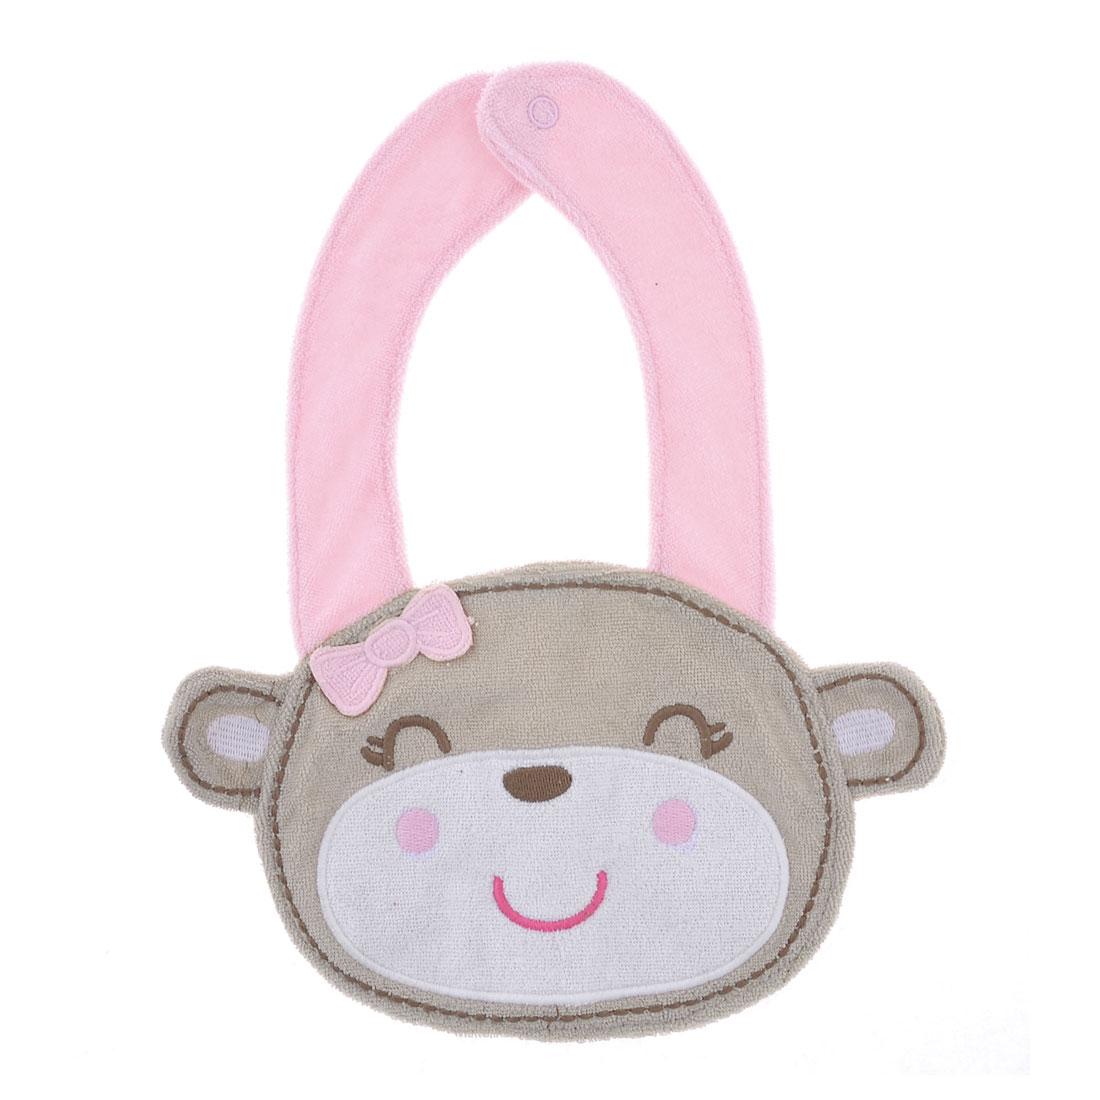 Monkey Design Baby Kids Infant Lunch Bib Saliva Towel Pink Khaki